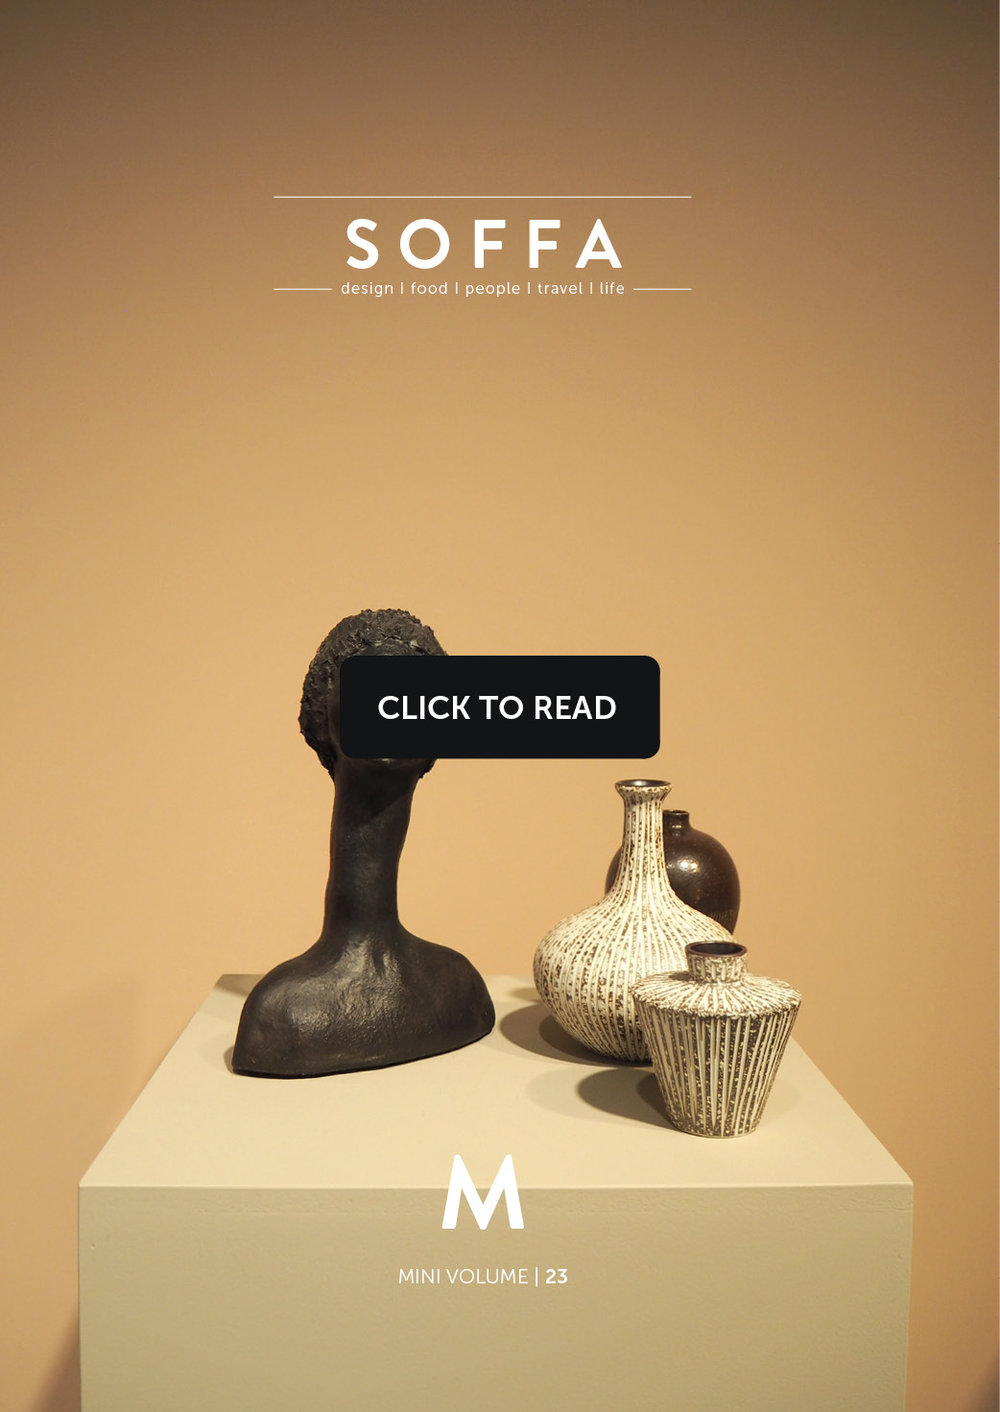 Soffa_MINY23_cover_proklik_button_ENG.jpg